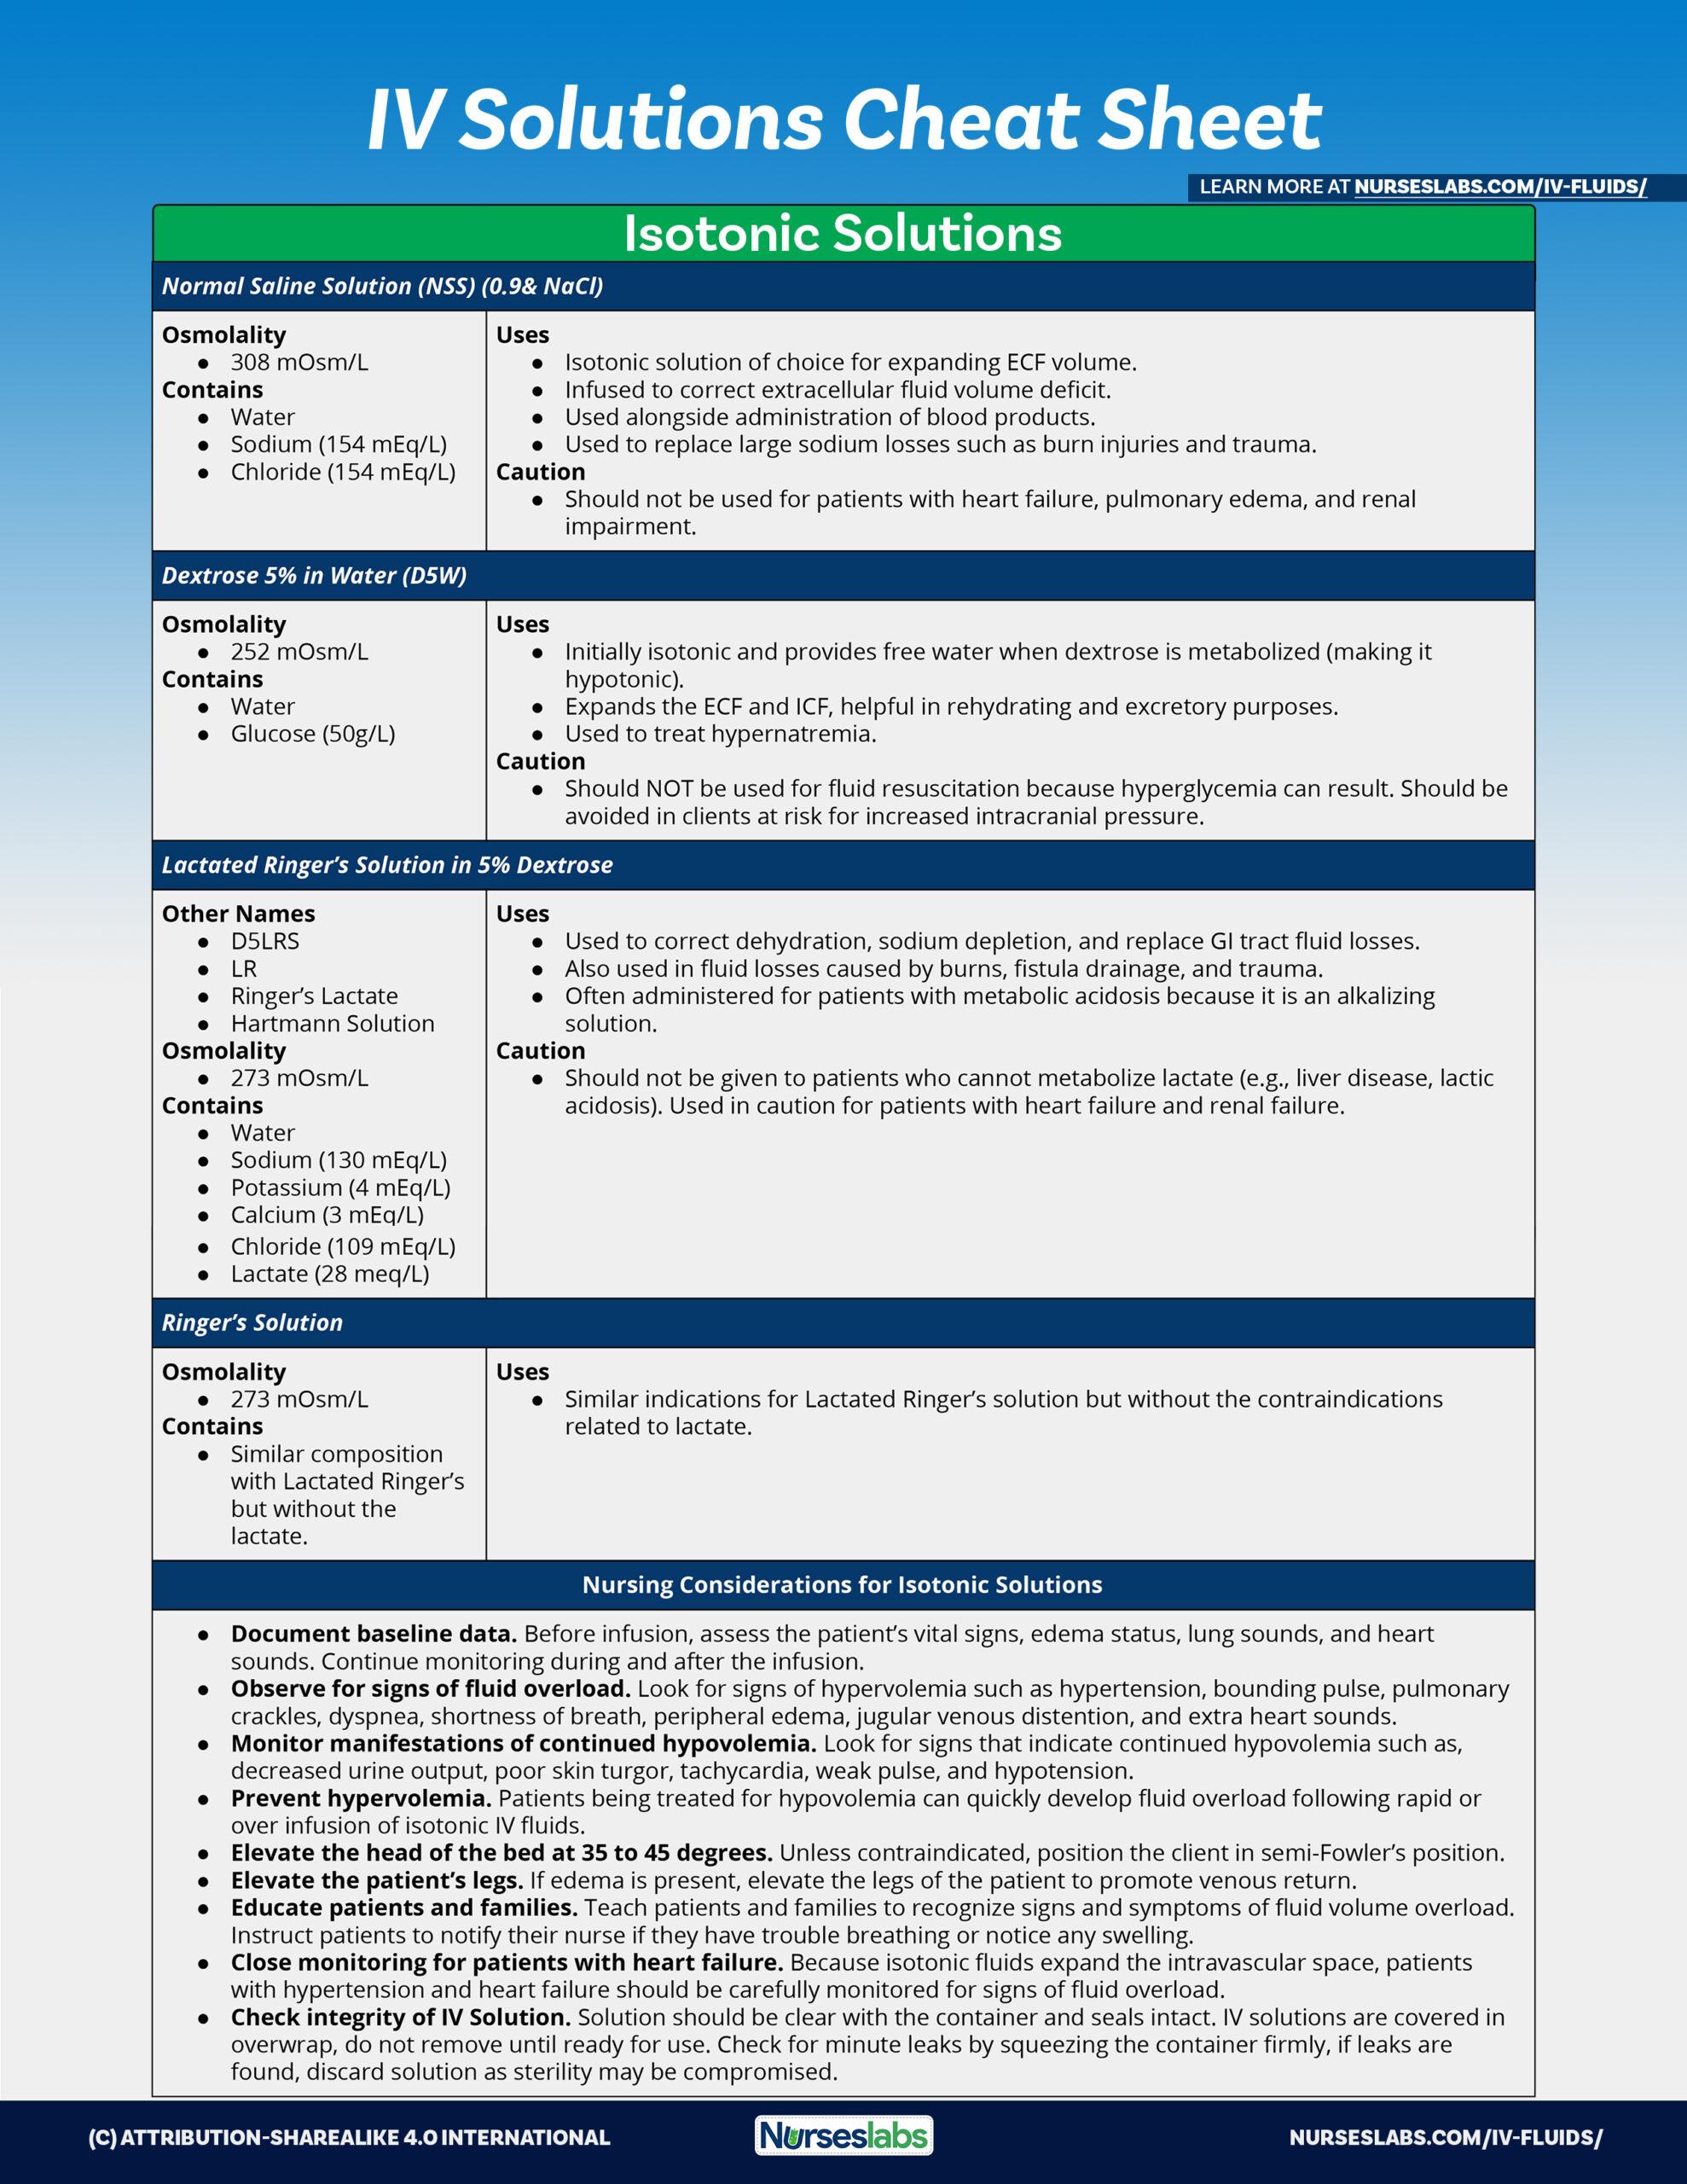 Isotonic IV Fluids Cheat Sheet